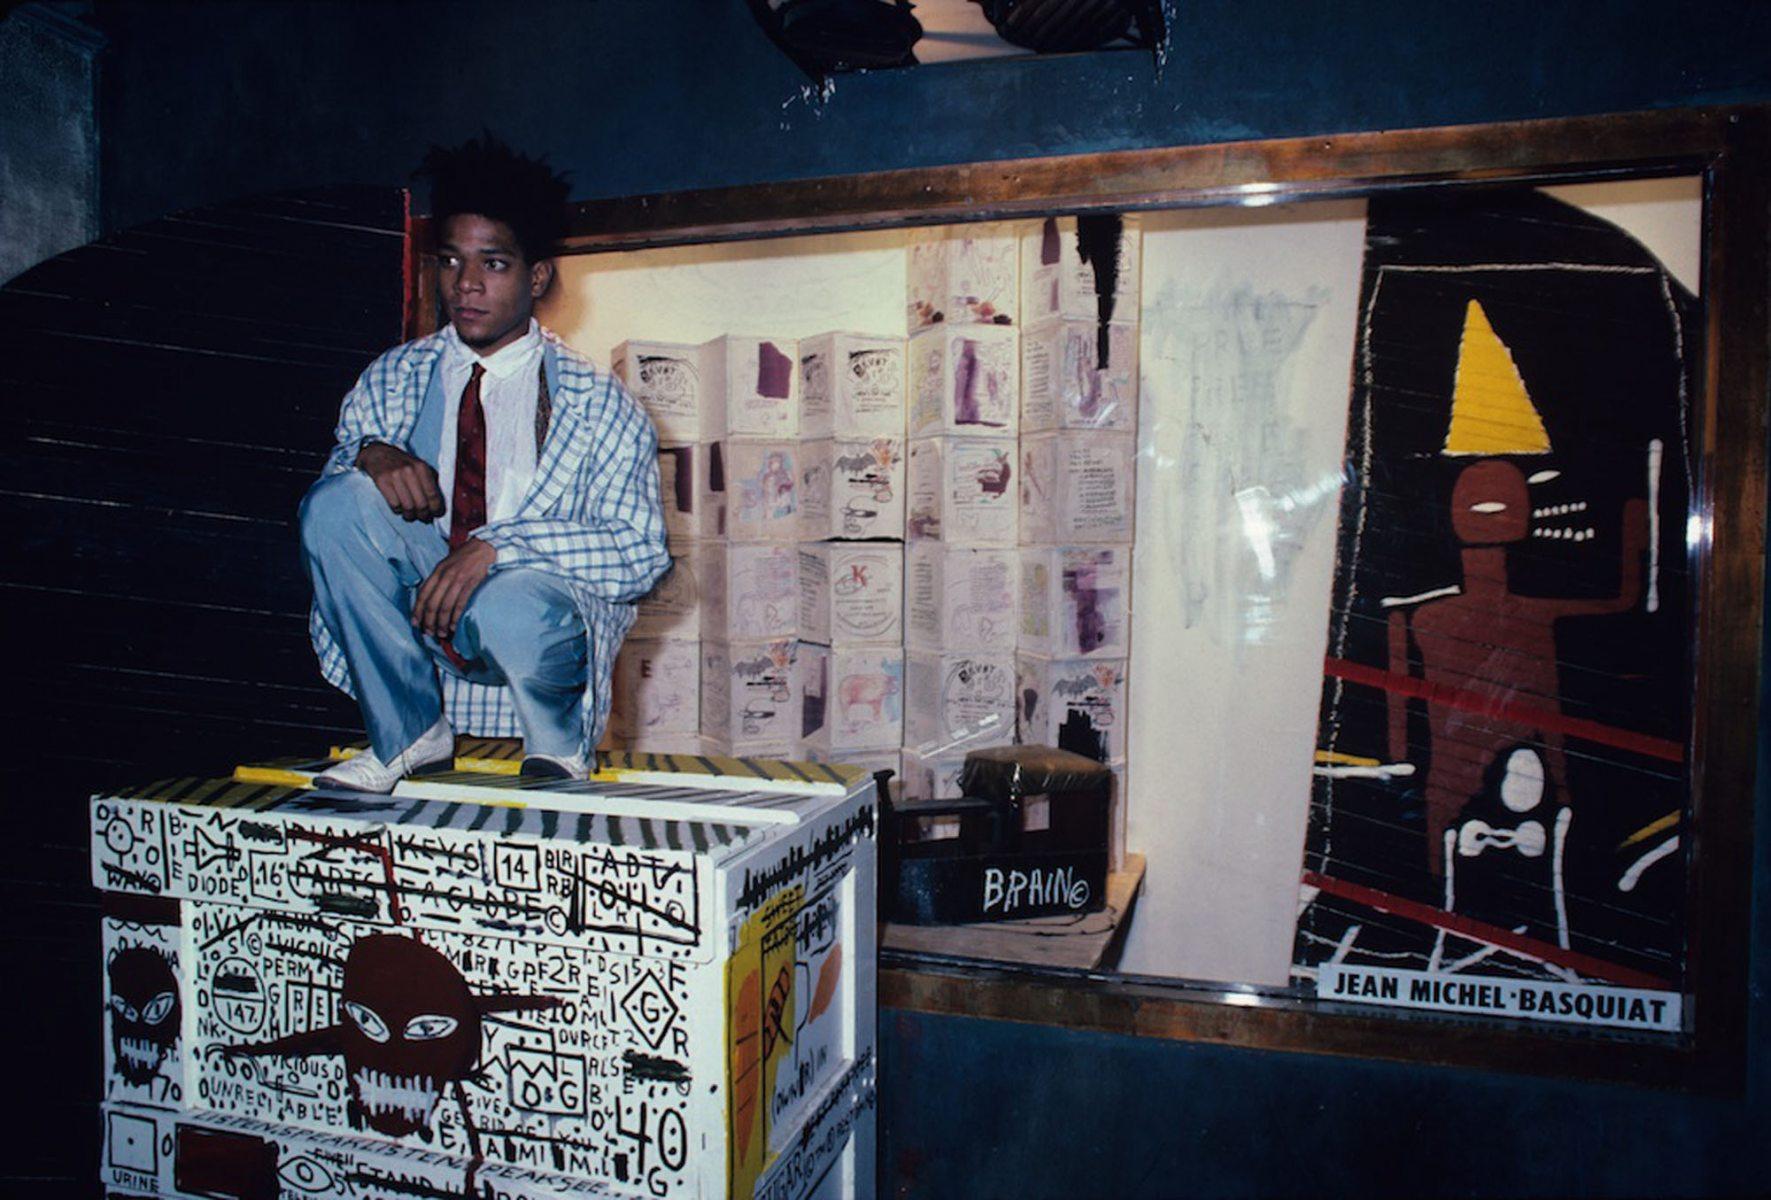 Jean-Michel Basquiat at the Area Club, NY 1985